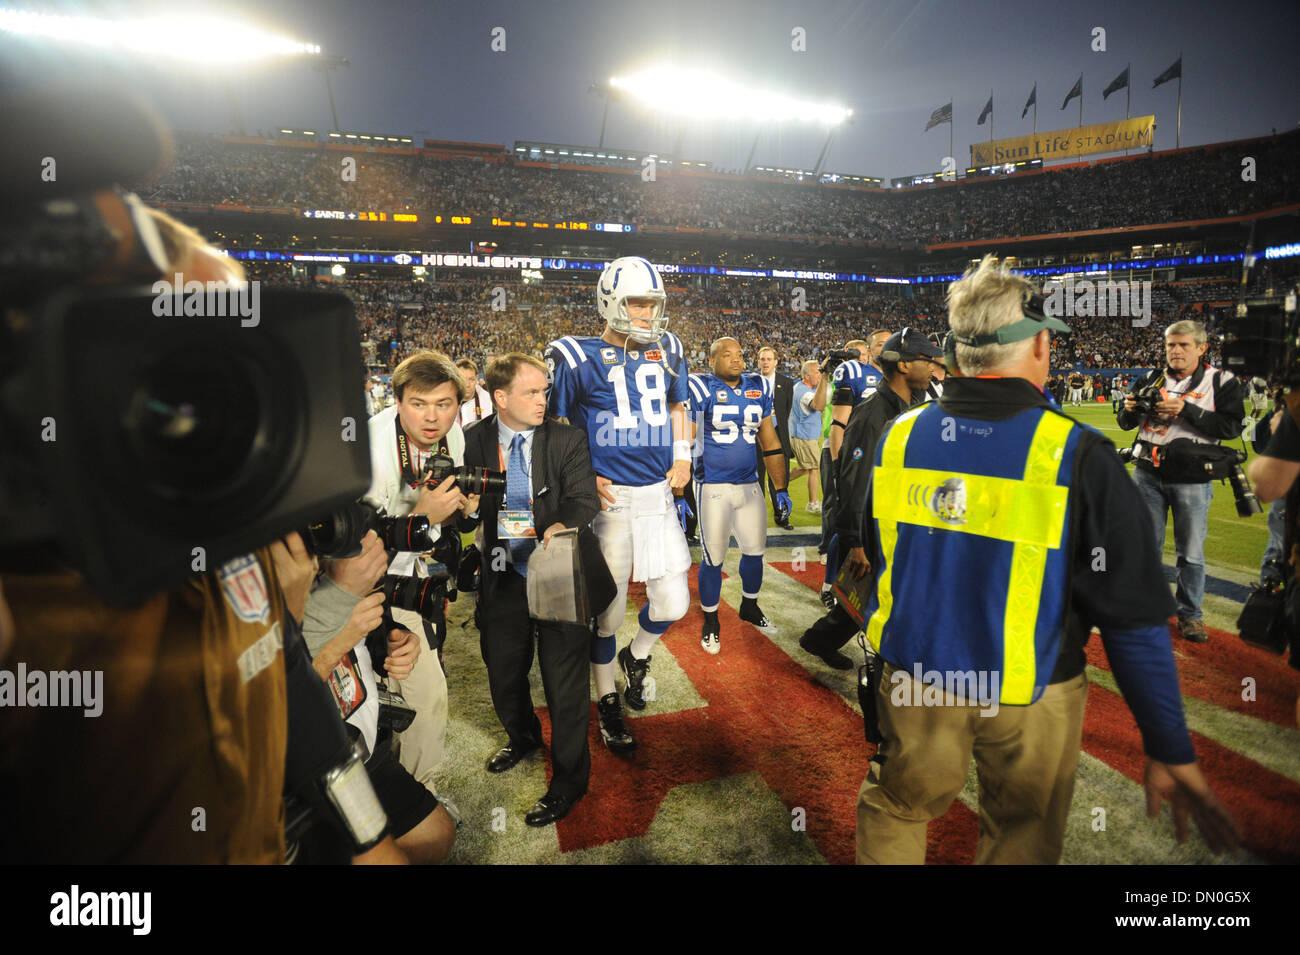 Feb 07, 2010 - Miami Gardens, Florida, USA - PEYTON MANNING waits for the pre-game coin flip at Super Bowl XLIV at Sun Life Stadium. (Credit Image: © Jim Rassol/Sun-Sentinel/ZUMApress.com) RESTRICTIONS: * U.S. Tabloids Rights OUT * - Stock Image